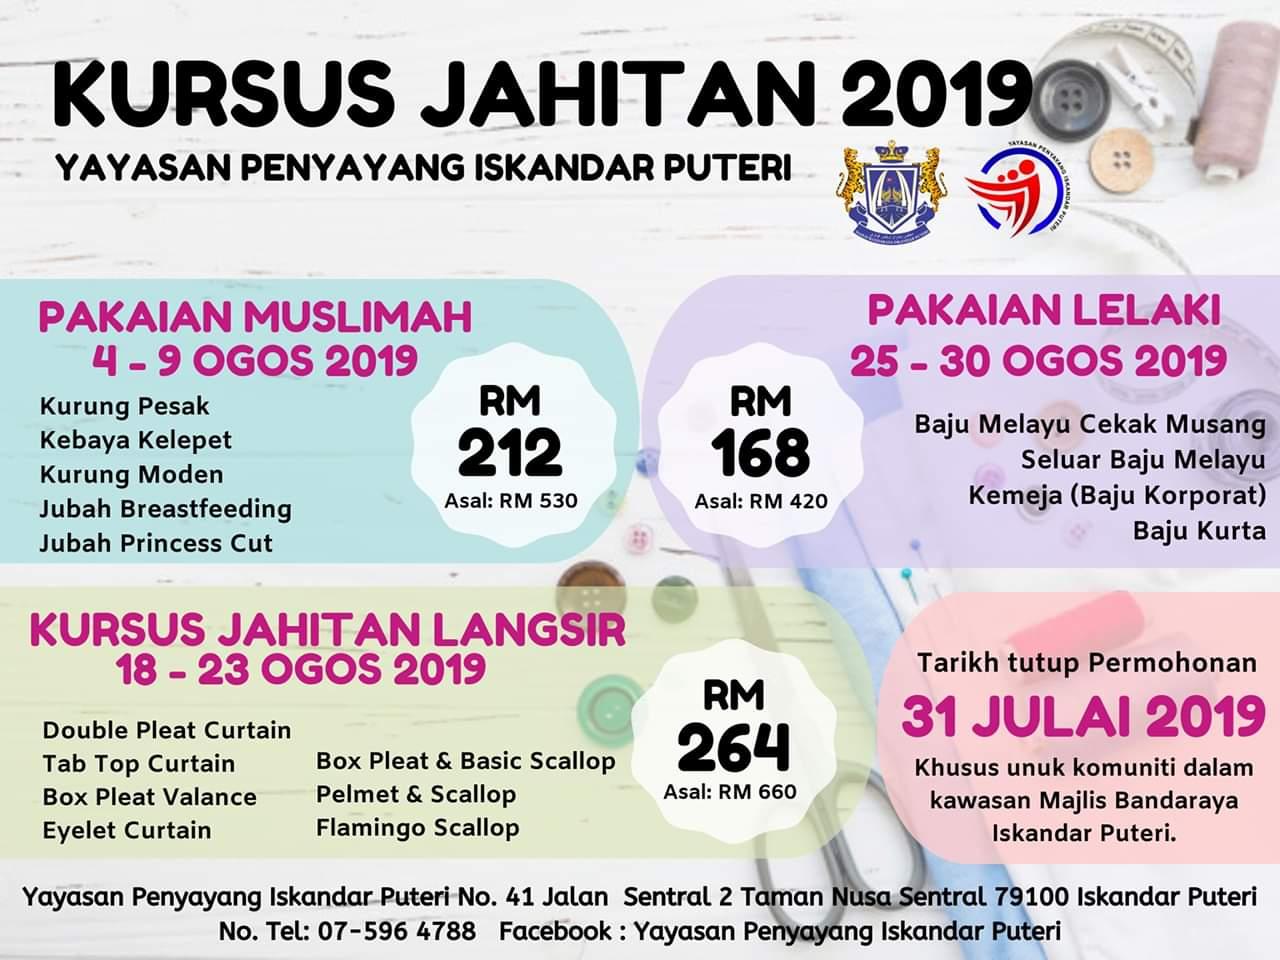 Kursus Jahitan 2019 Anjuran Yayasan Penyayang Iskandar Puteri